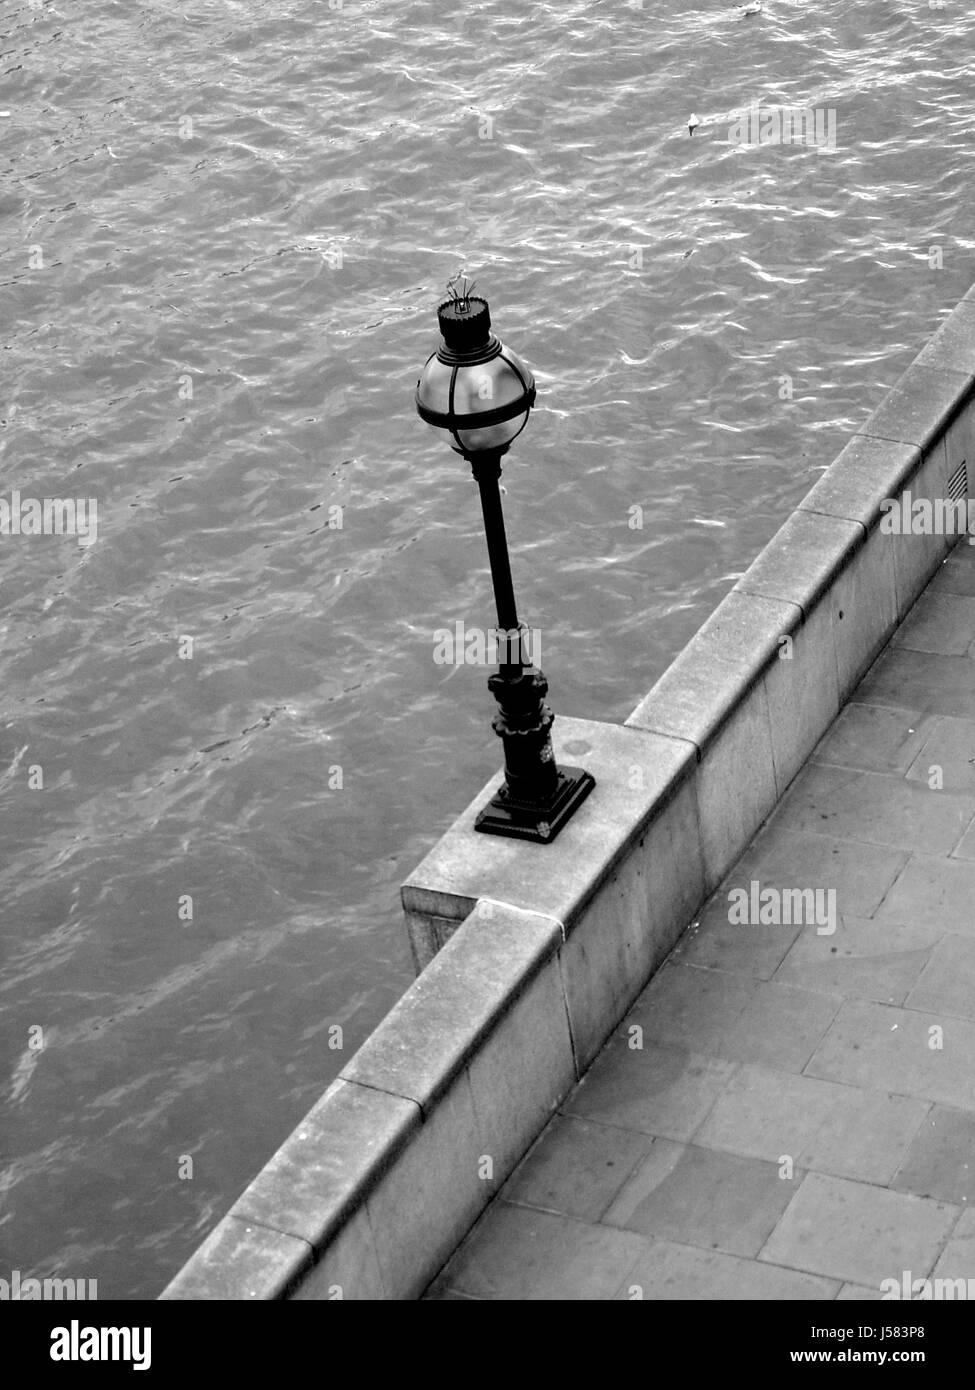 stone,bw,london,england,thames,shiner,light,lamp,luminary,day,water - Stock Image